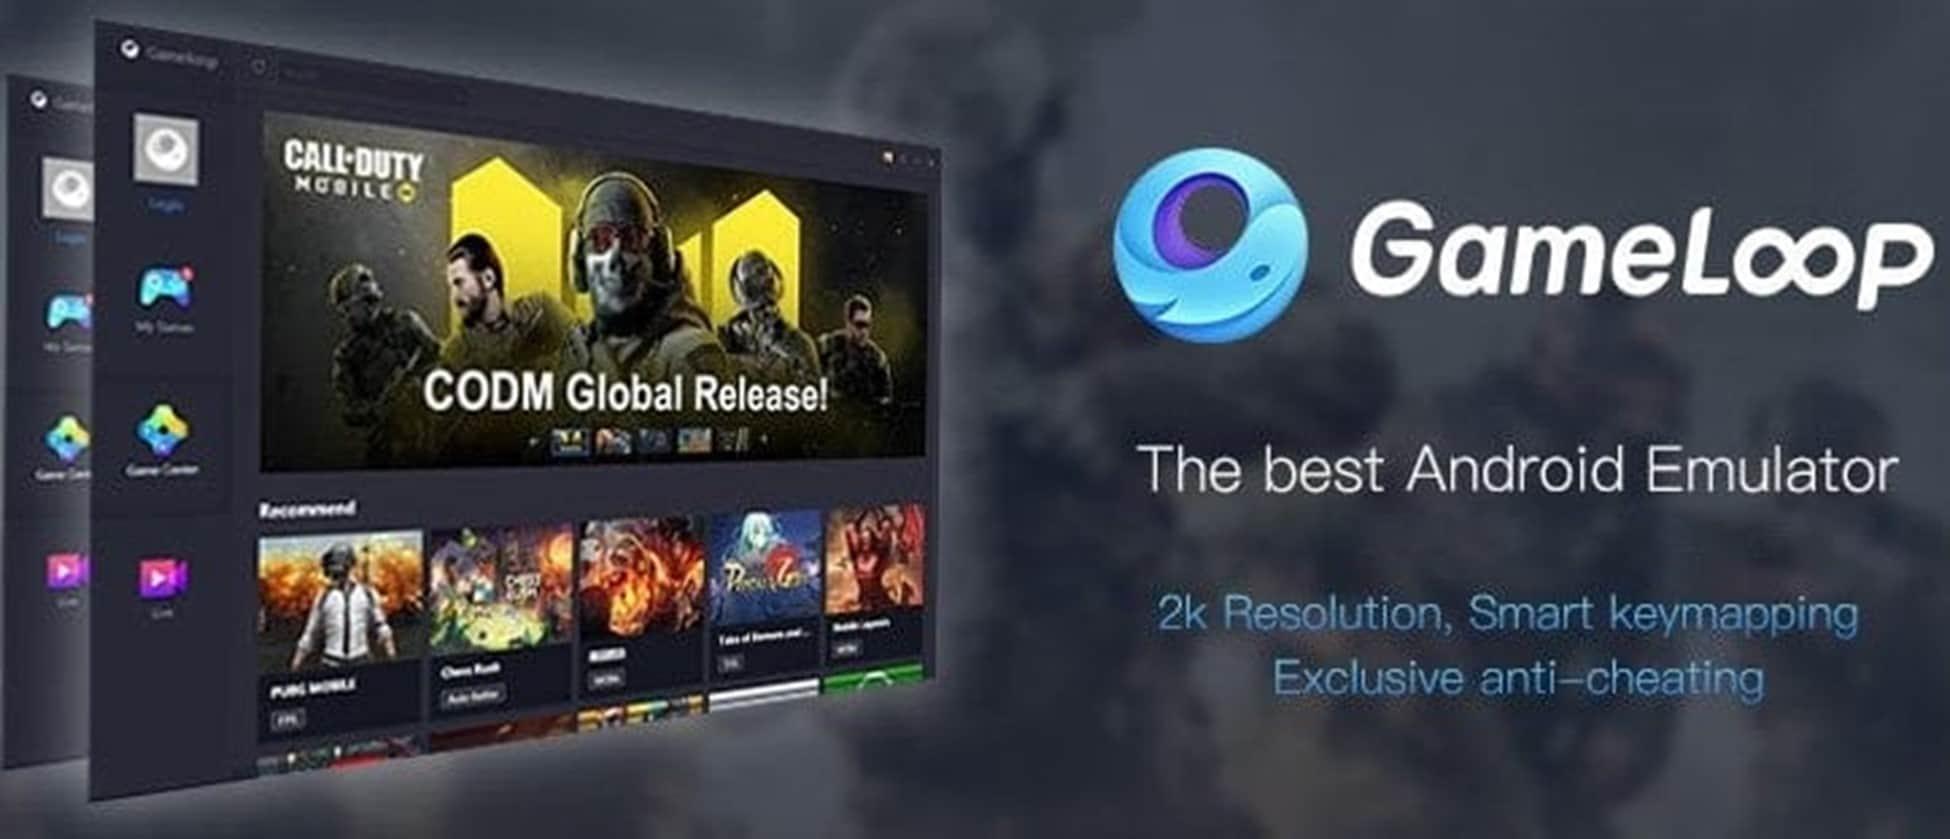 gameloop-poster